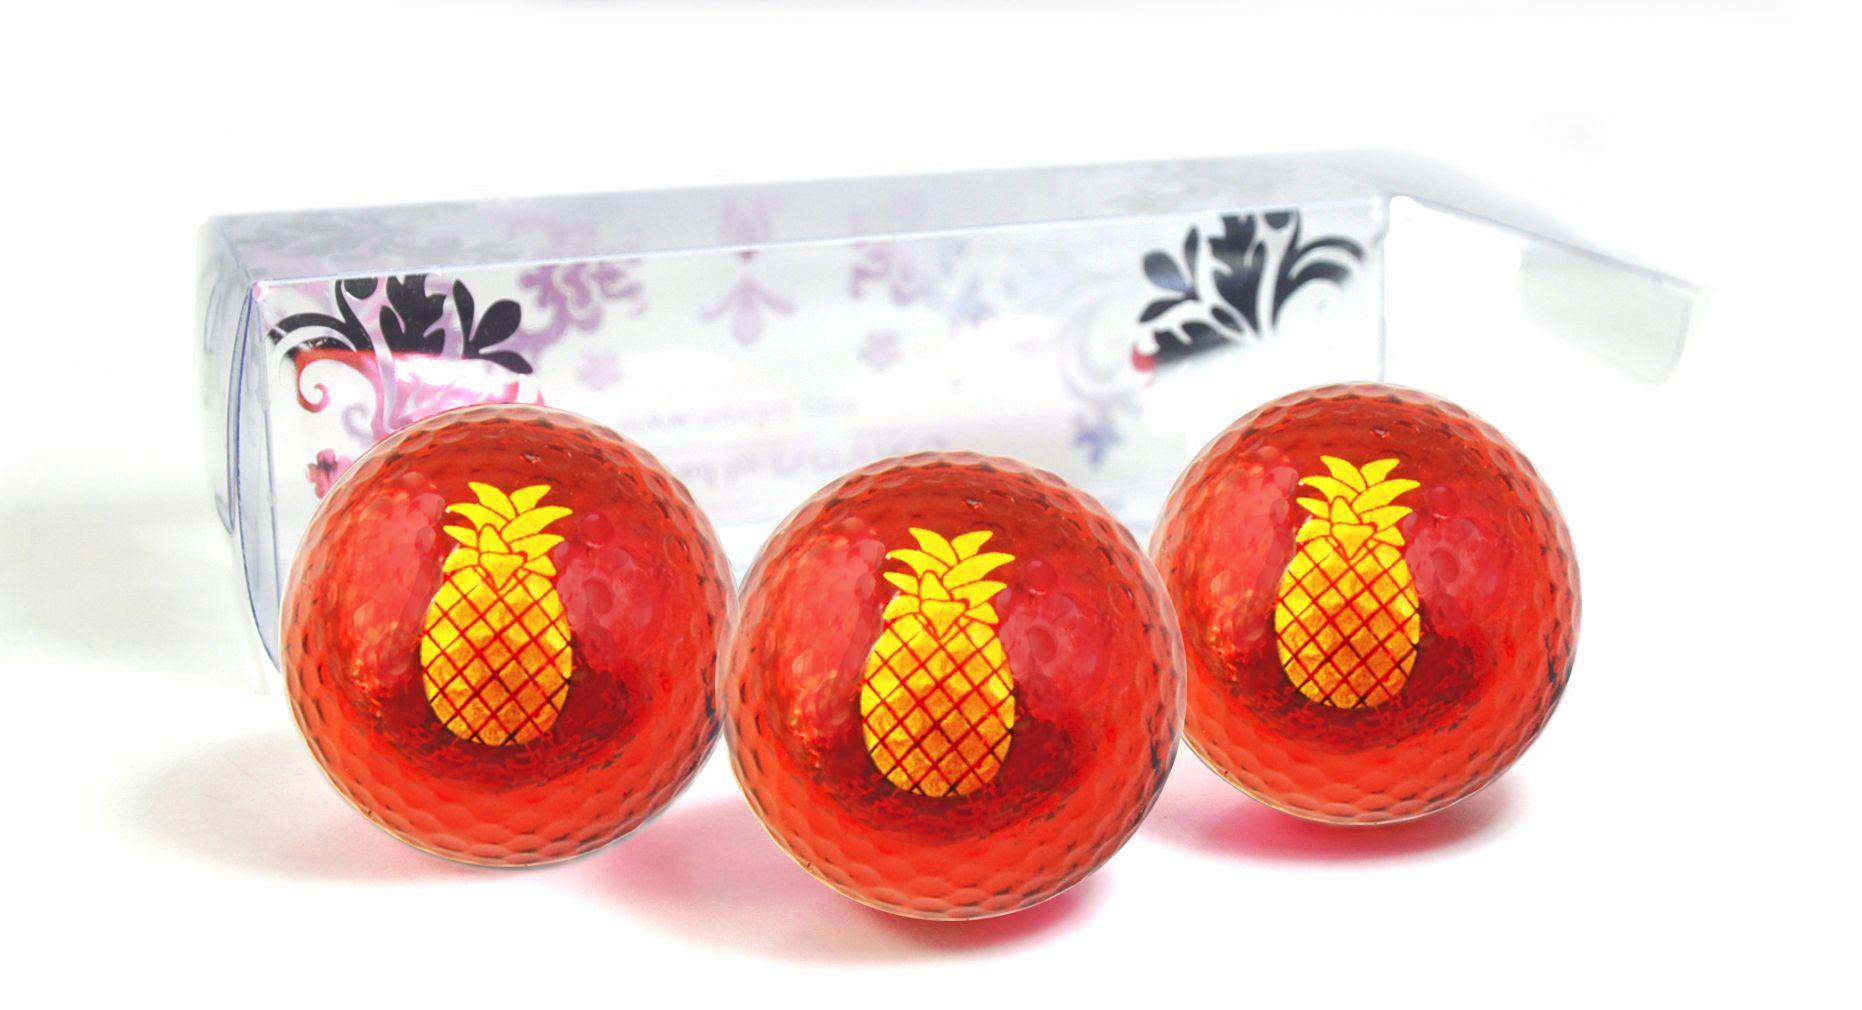 Metallic Red Golf Balls with Yellow Pineapple Imprint- by Navika. Bling your swing! Chromax golf balls. Hawaii themed golf balls.